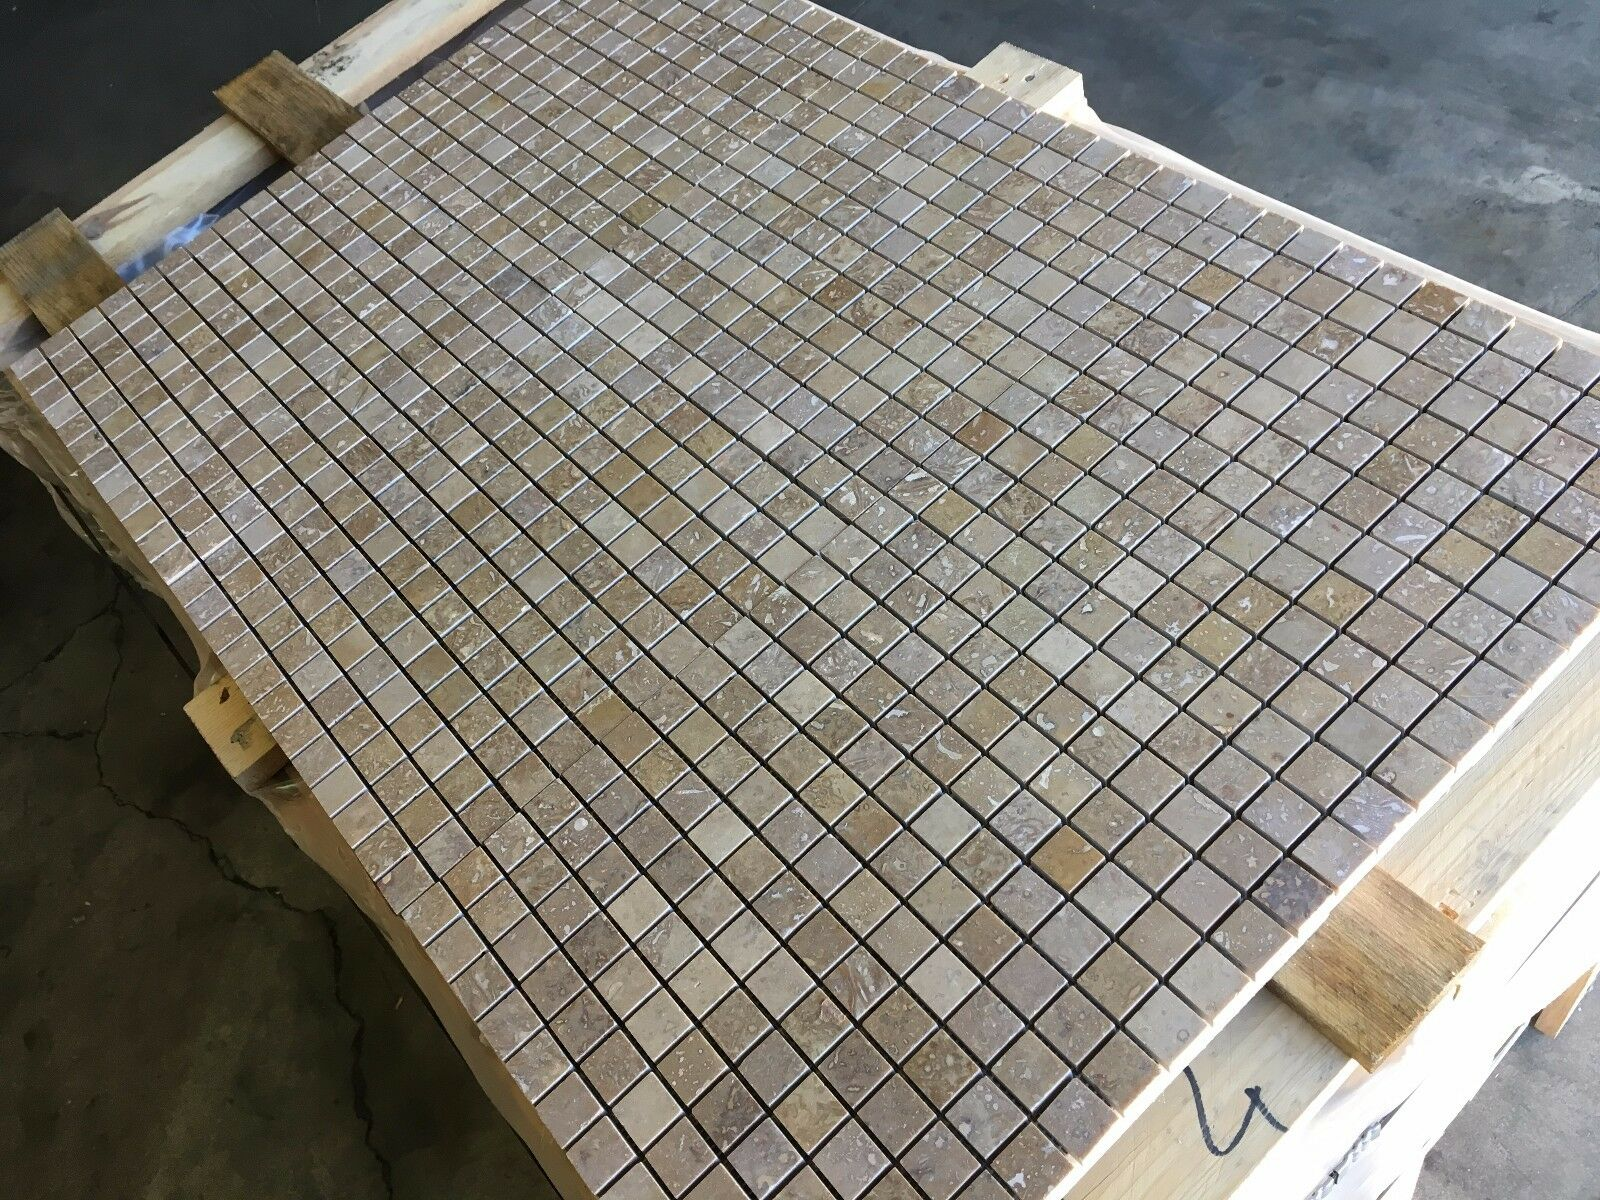 TraGrünine Mosaic, Noce Honed Filled Mosaic Tiles, 25X25MM  Mosaics